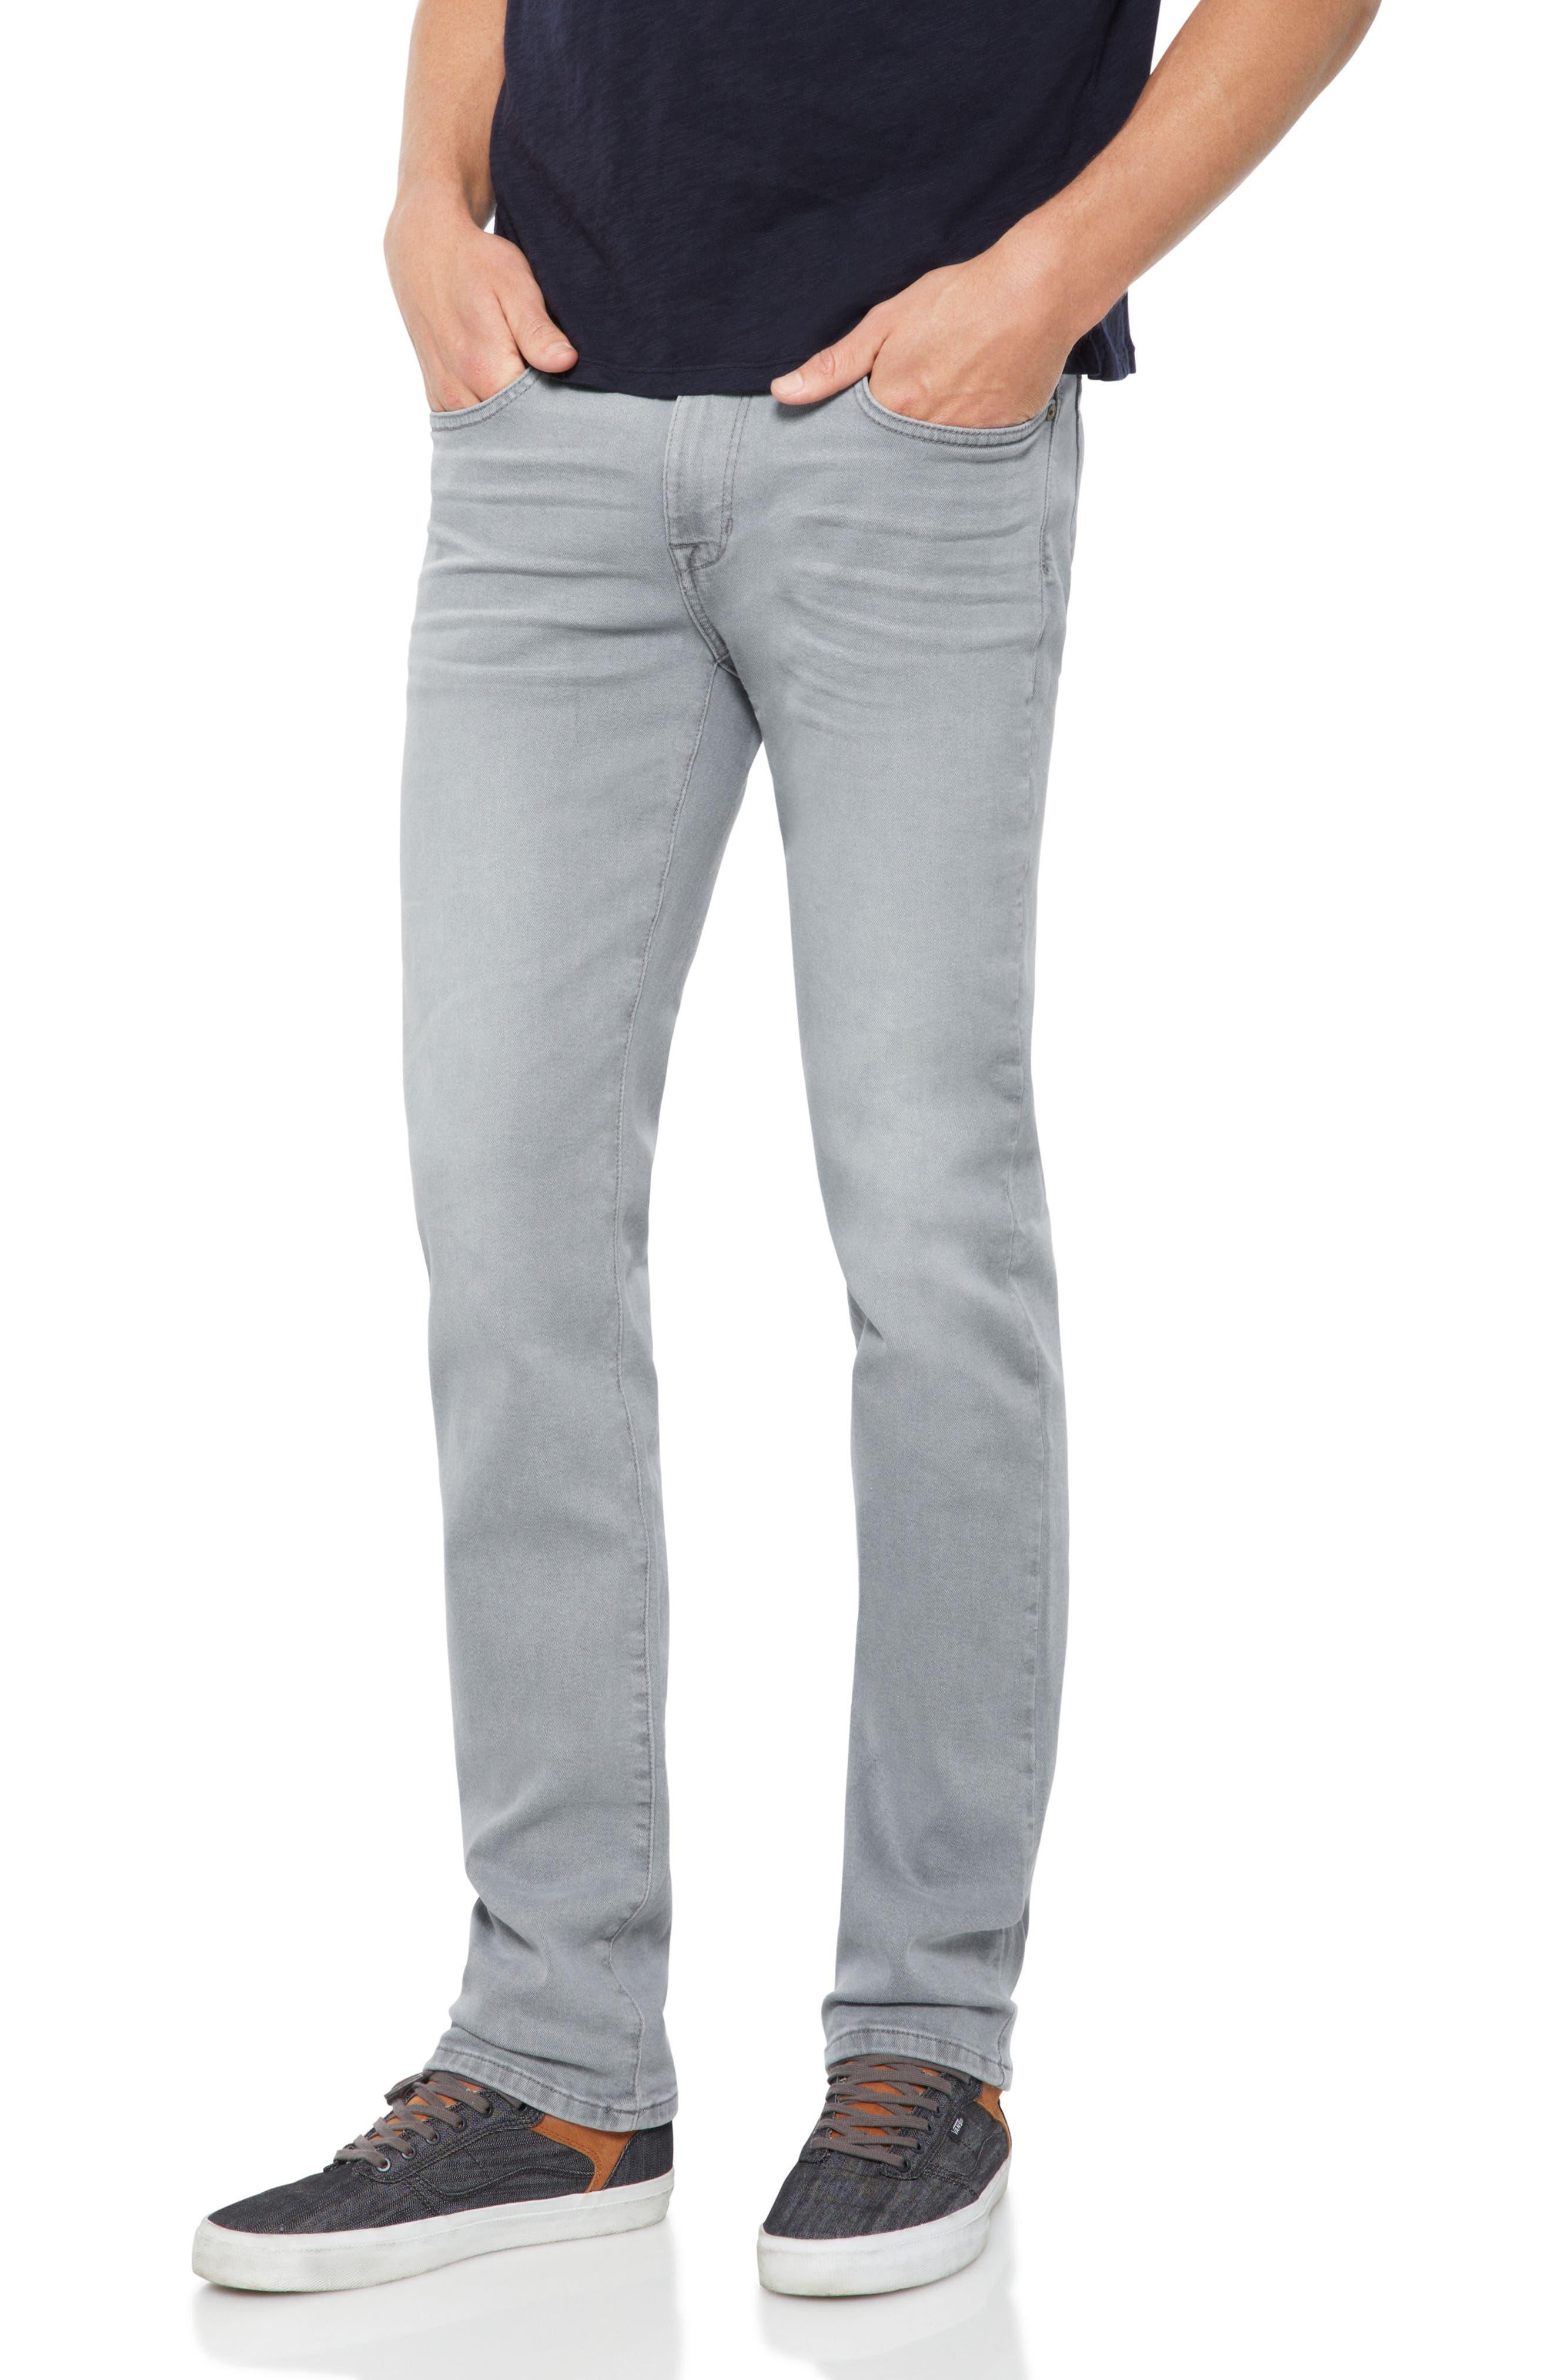 Brixton Slim Straight Leg Jeans,                             Main thumbnail 1, color,                             Feather